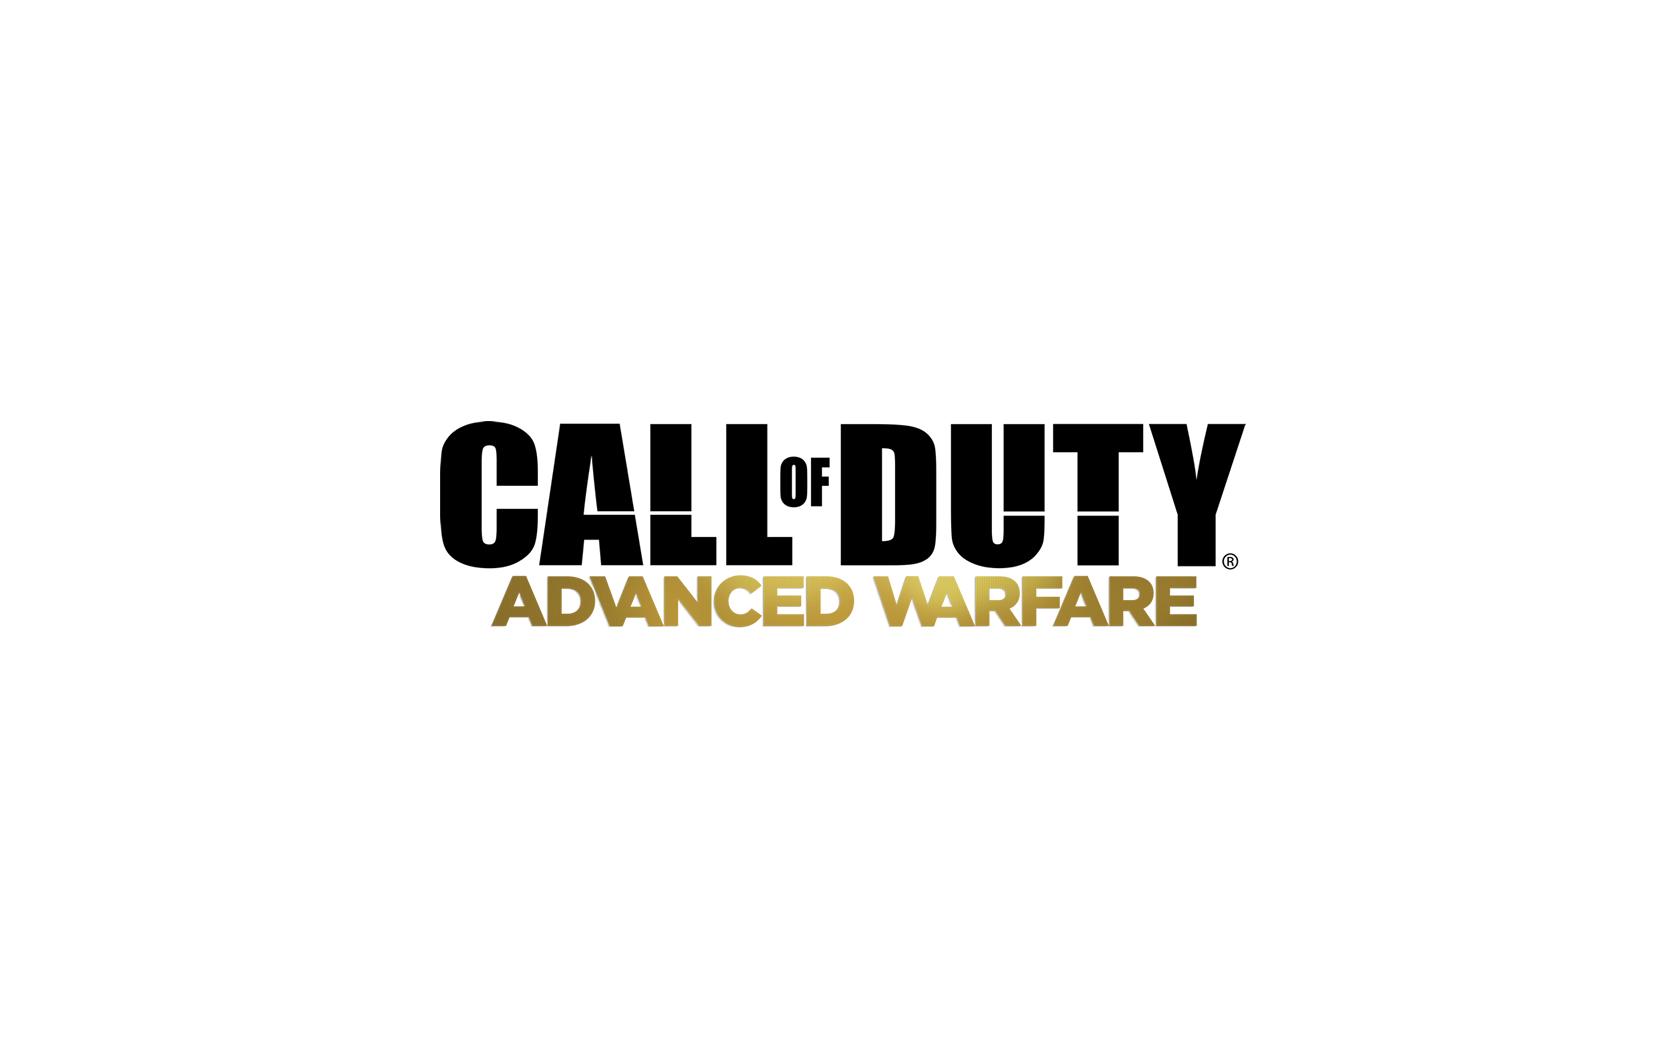 COD Advanced Warfare: Wallpaper